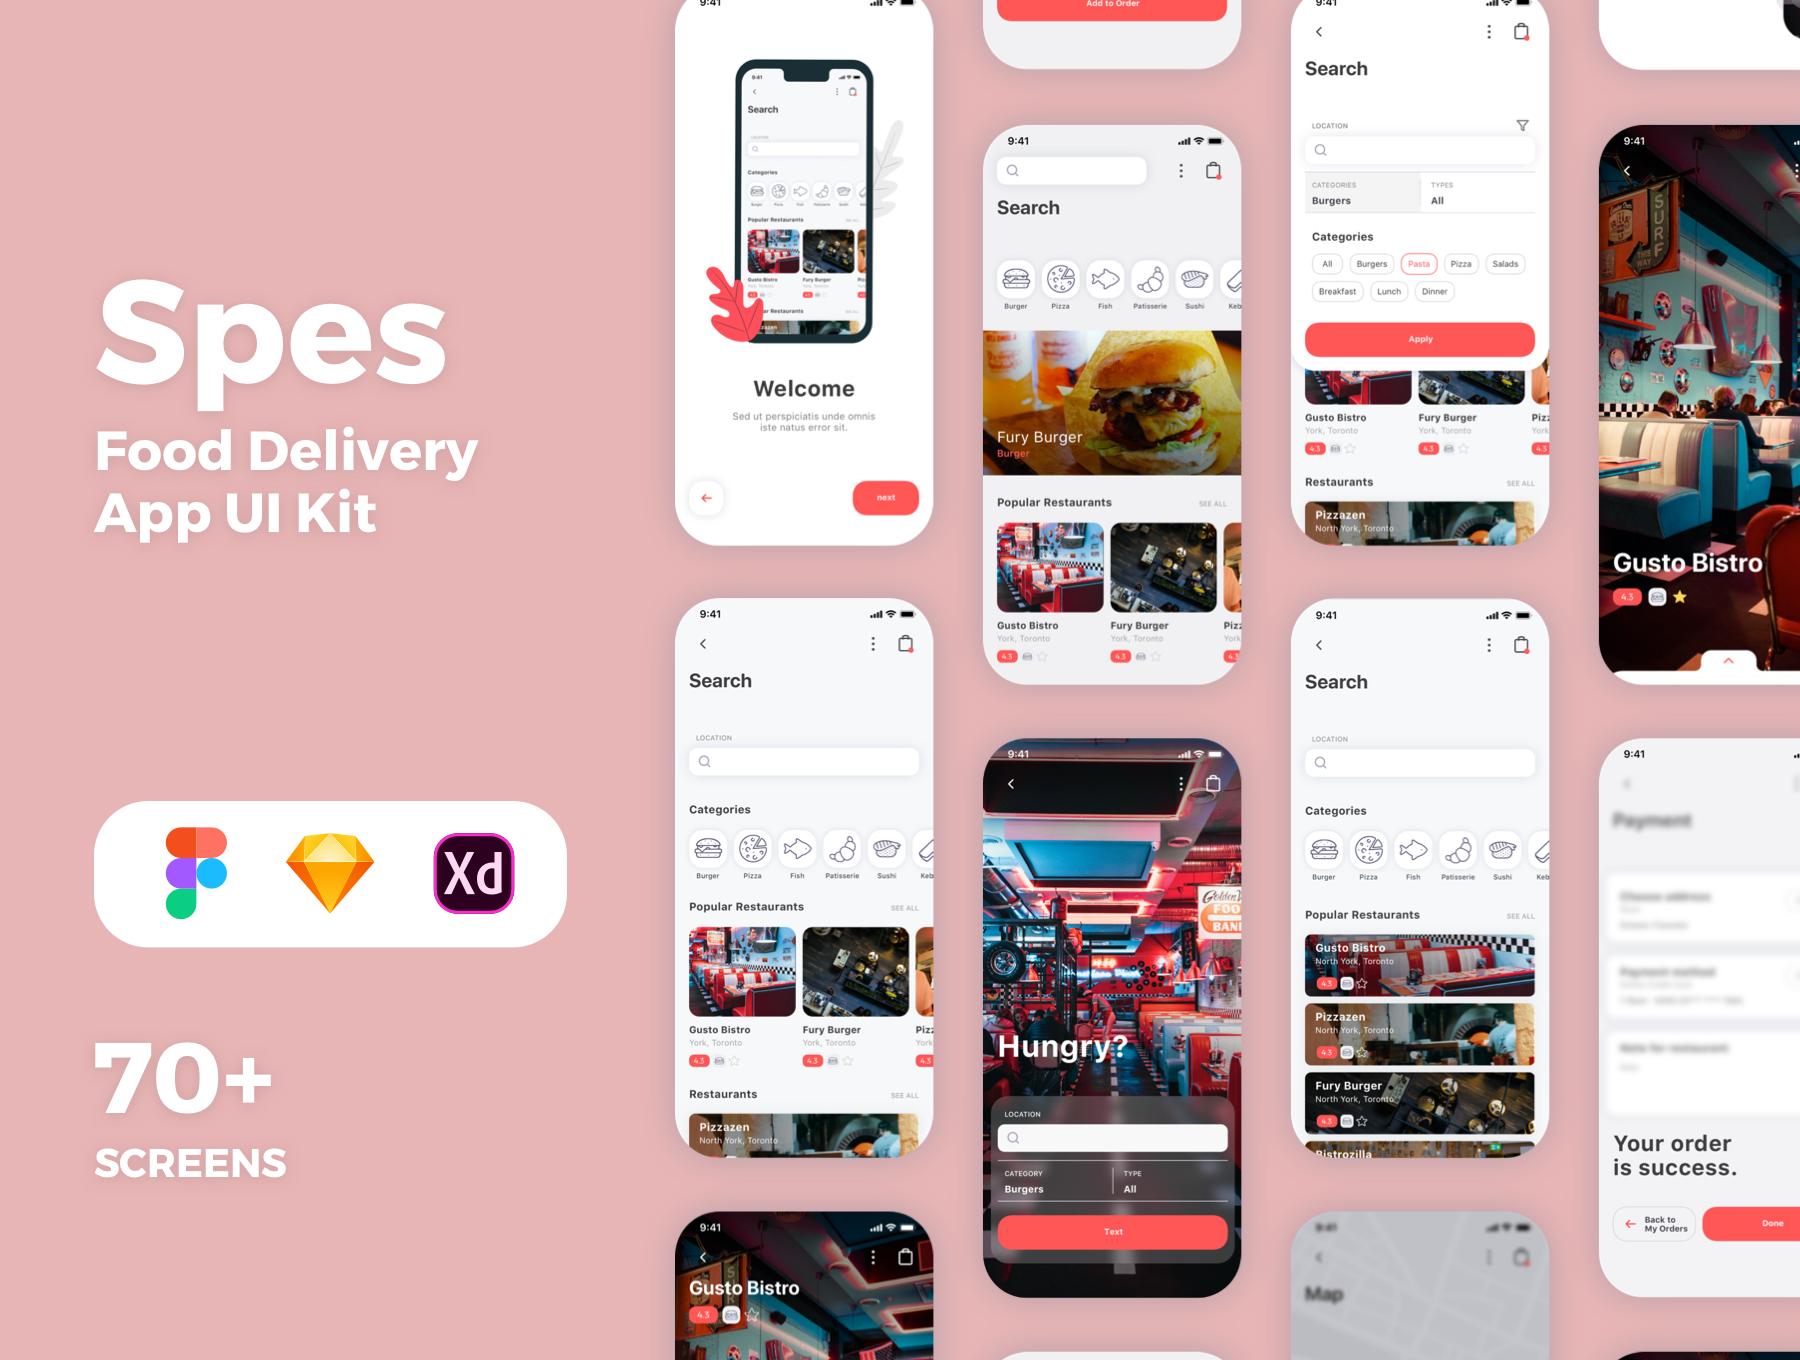 食物外卖配送应用APP设计UI套件 Spes Food Delivery App UI Kit插图